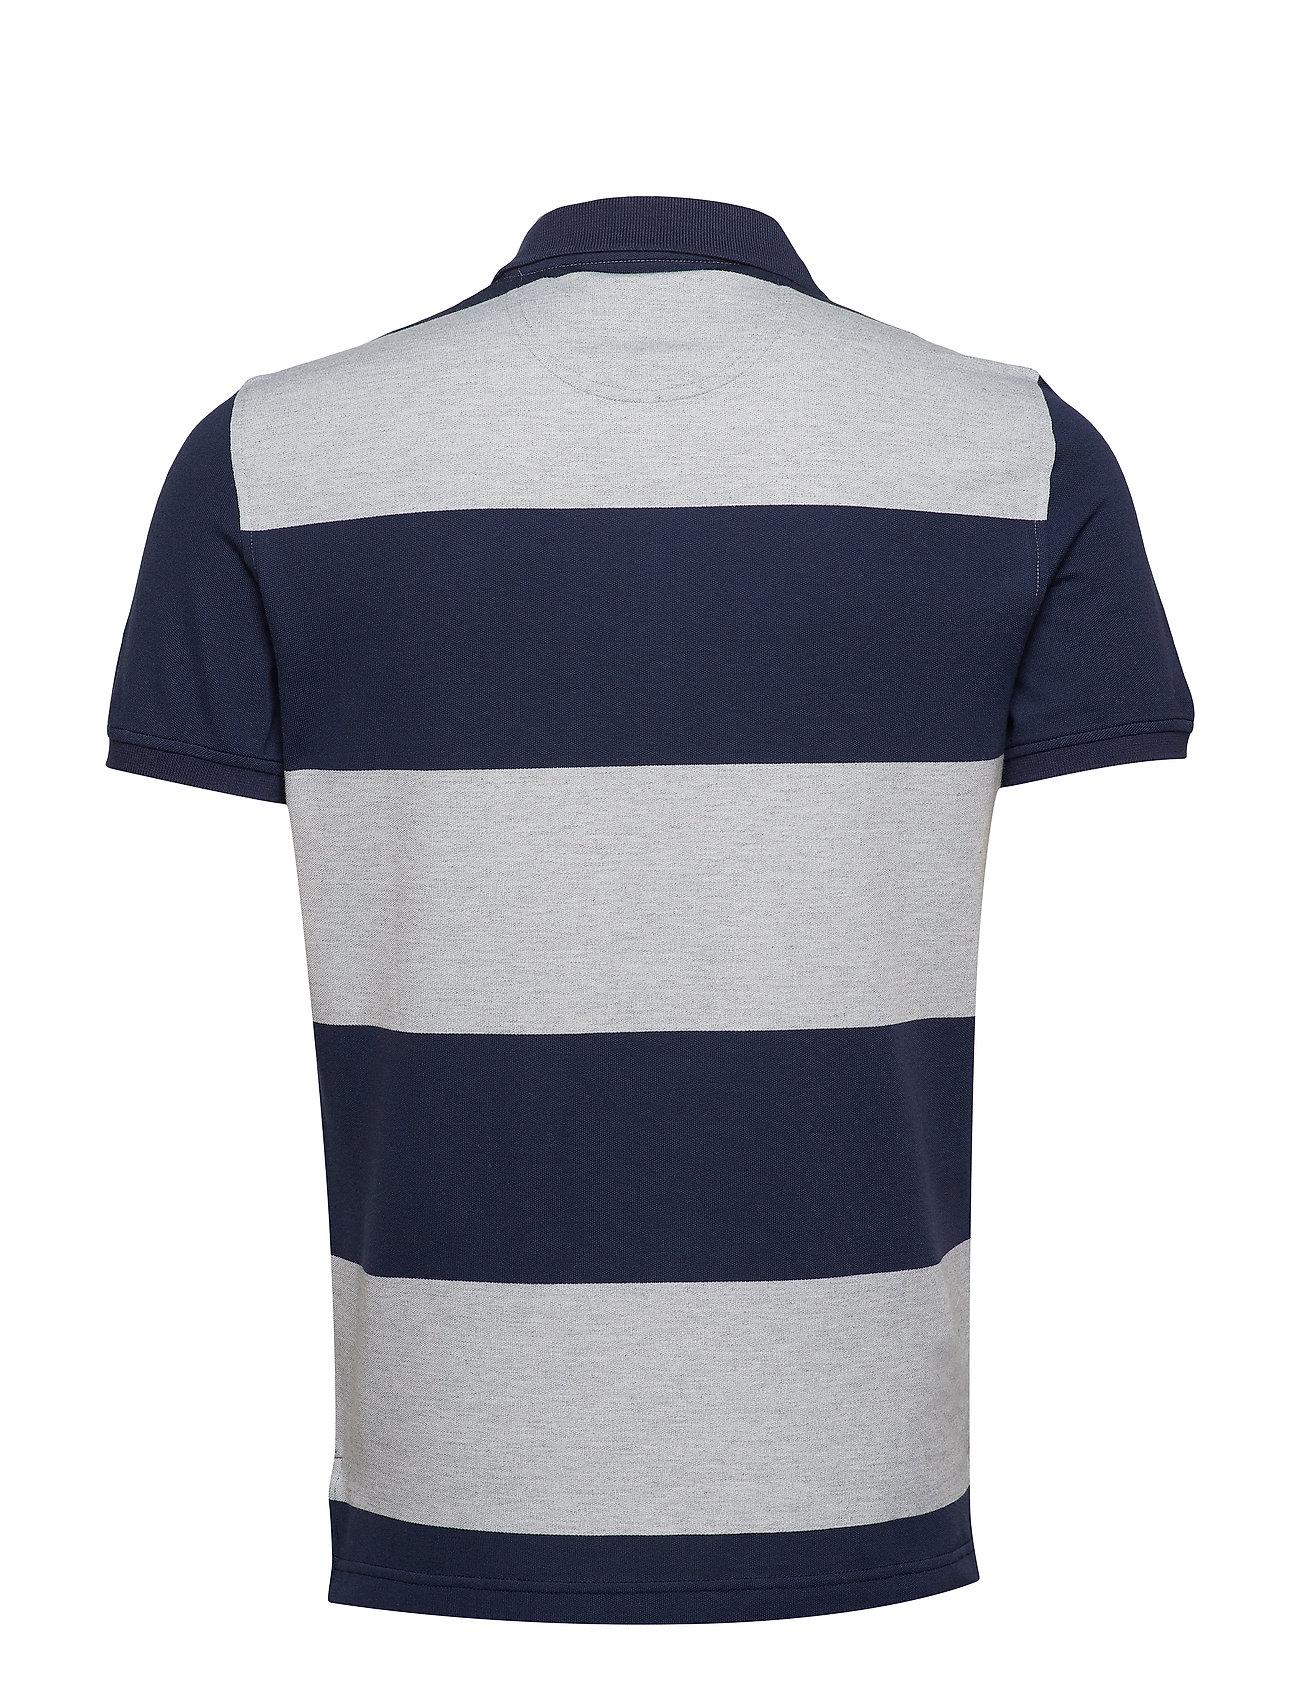 Pololt HtrIzod Stripe Performance Grey Rugby LqVUjSGzMp